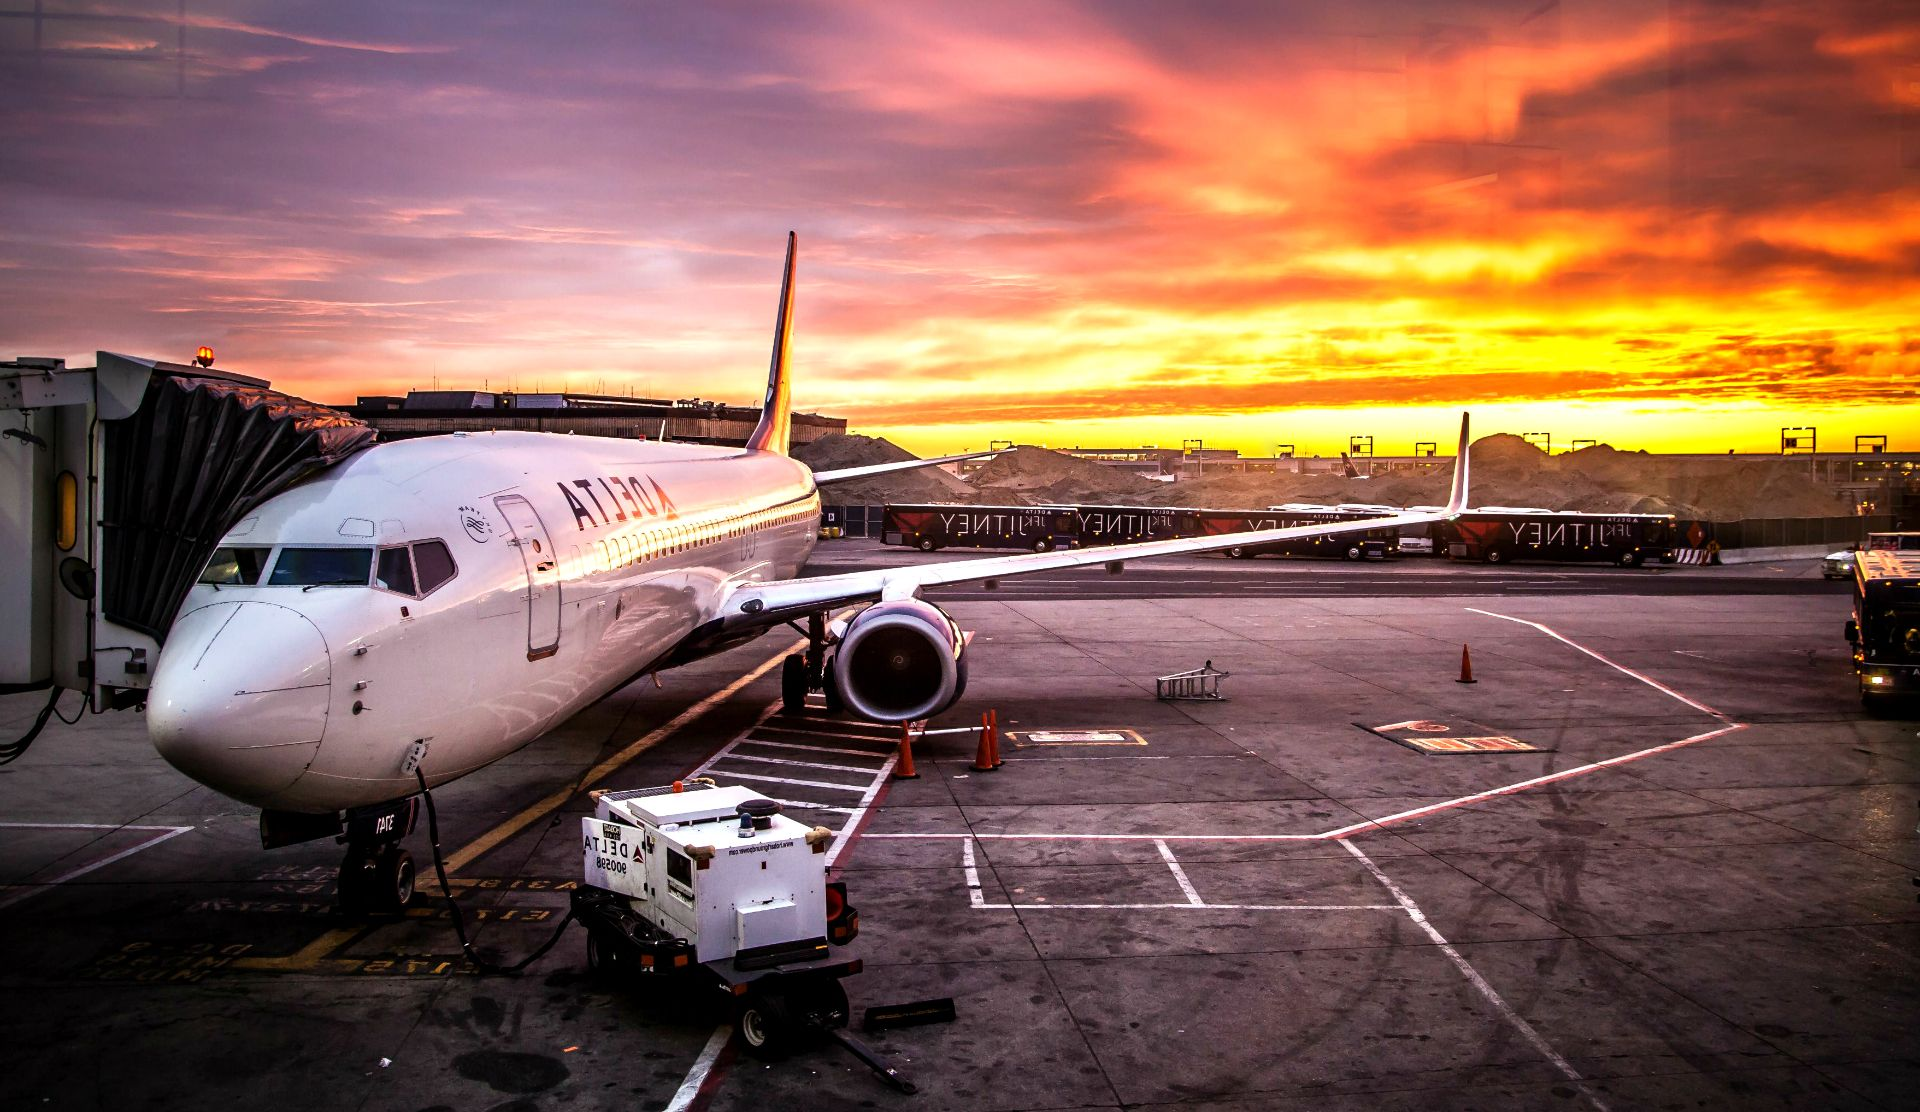 Plane Airport HD Wallpaper - HD Wallpapers 4 US